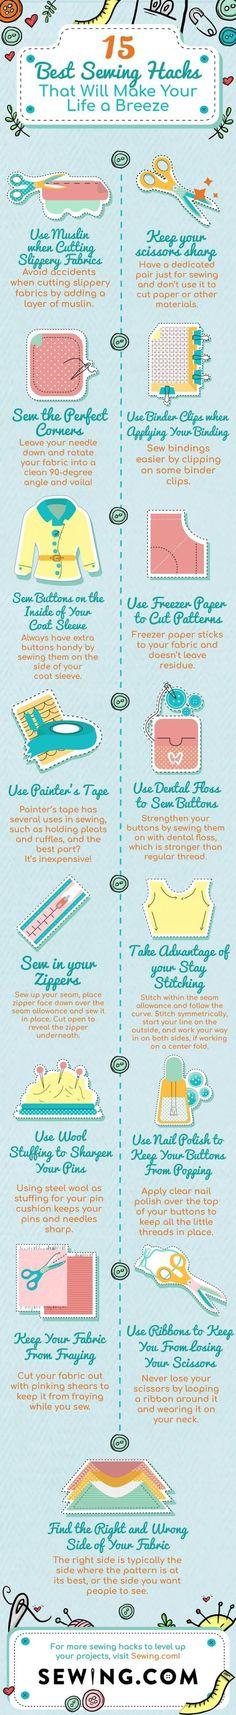 Genius Sewing Hacks to Make Your Life Easier   Best Sewing Hacks That Will Make Your Life a Breeze